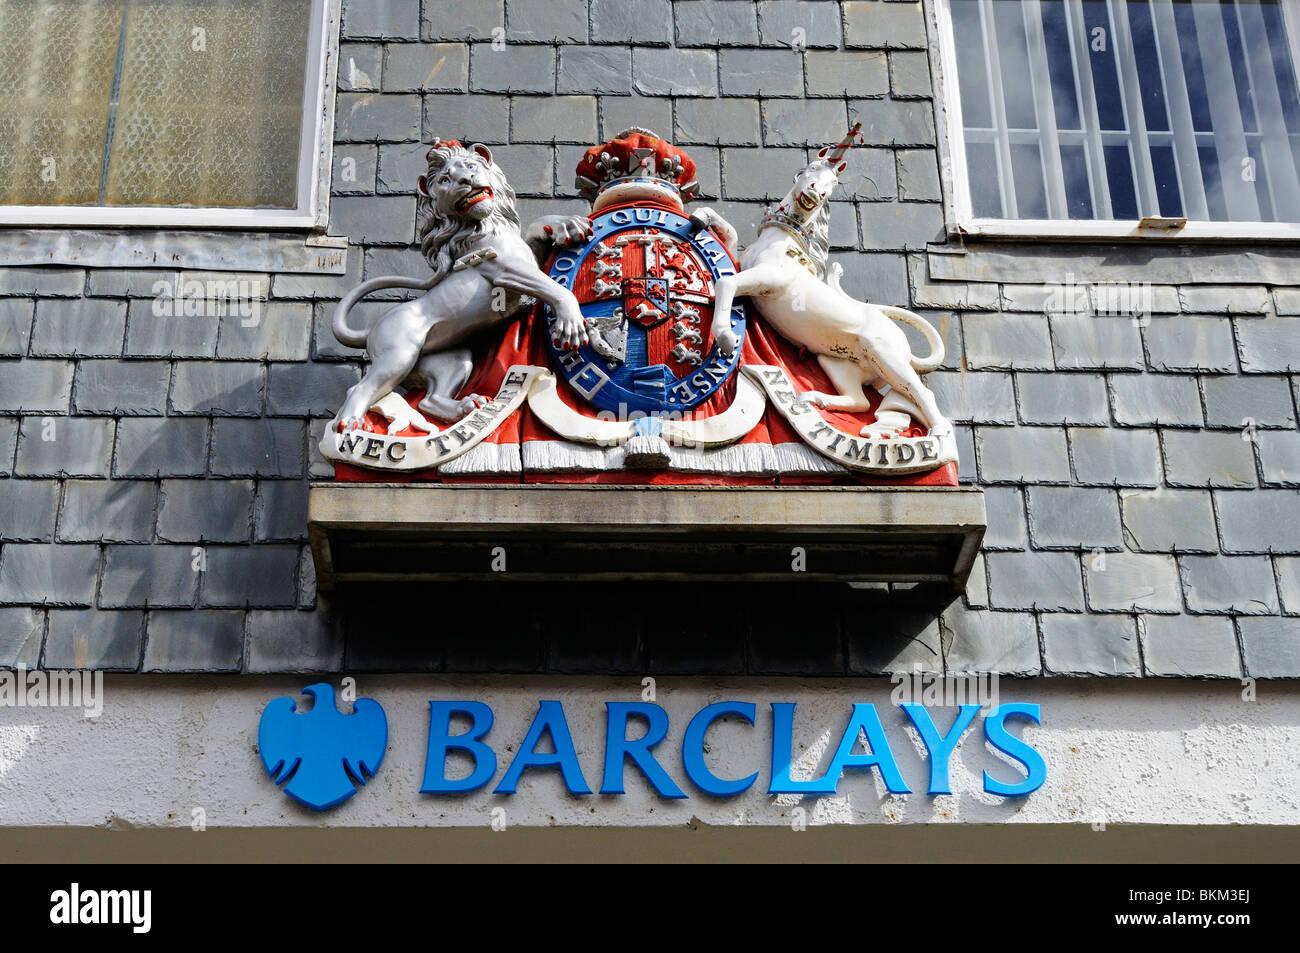 barclays bank sign, uk - Stock Image